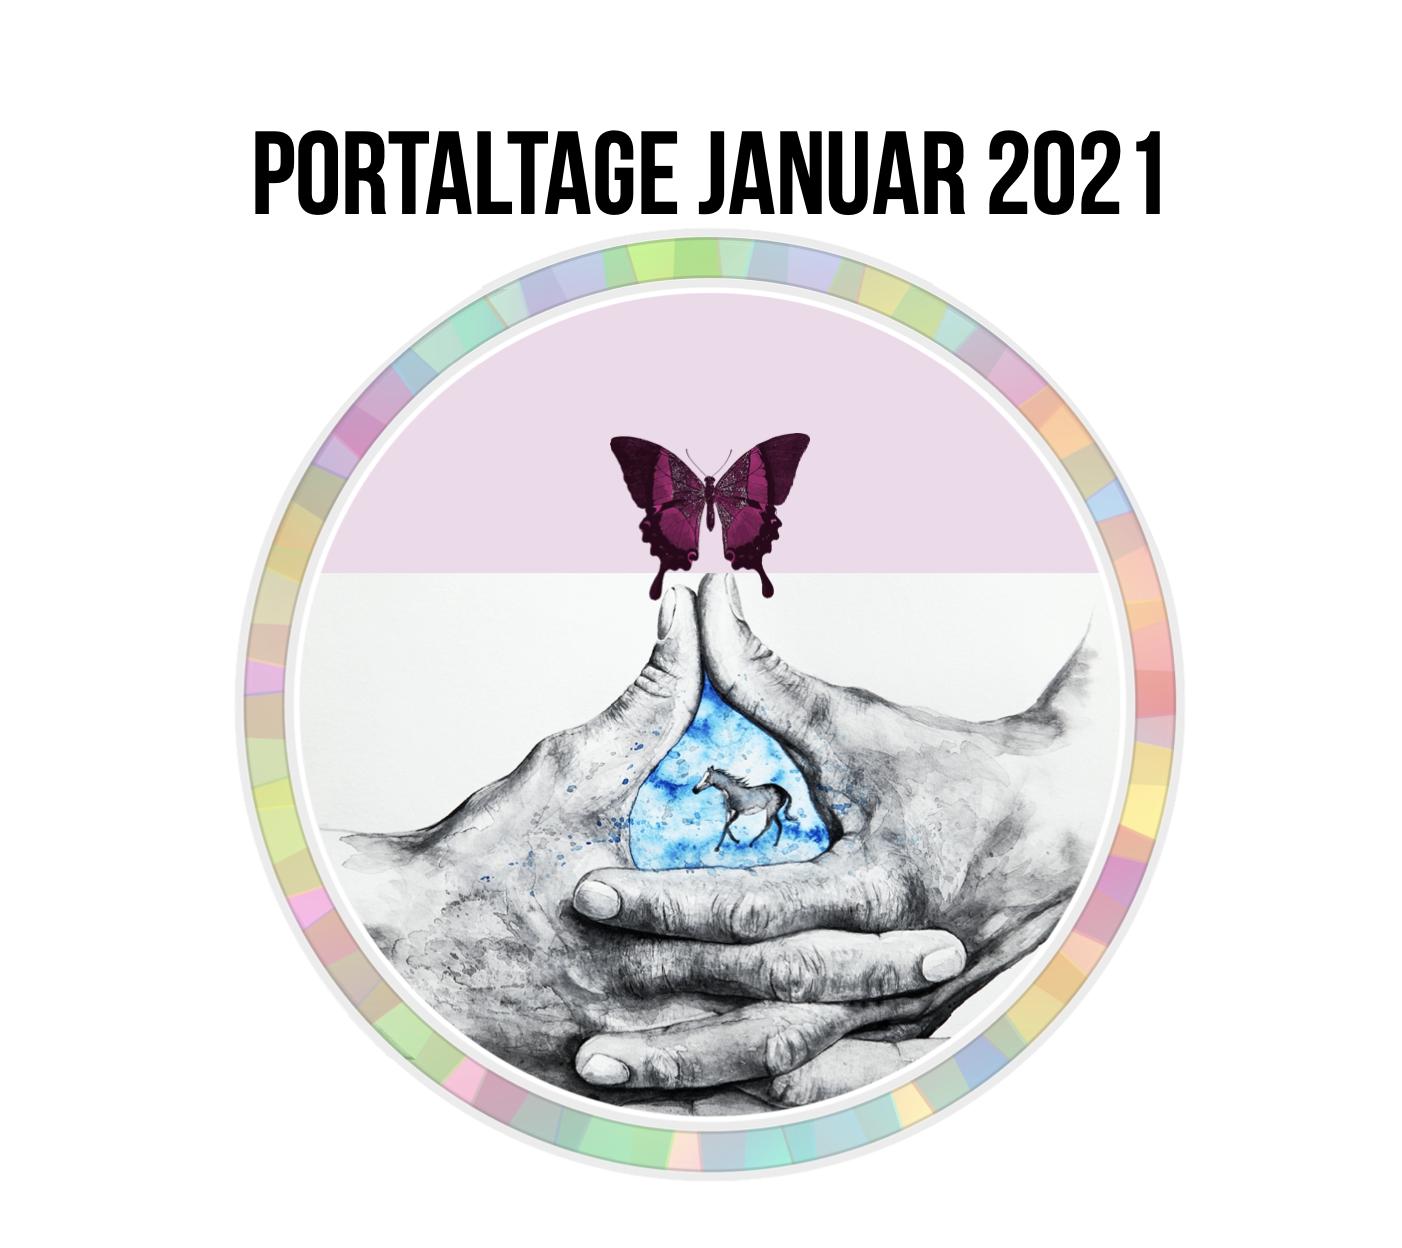 Portaltage im Januar 2021